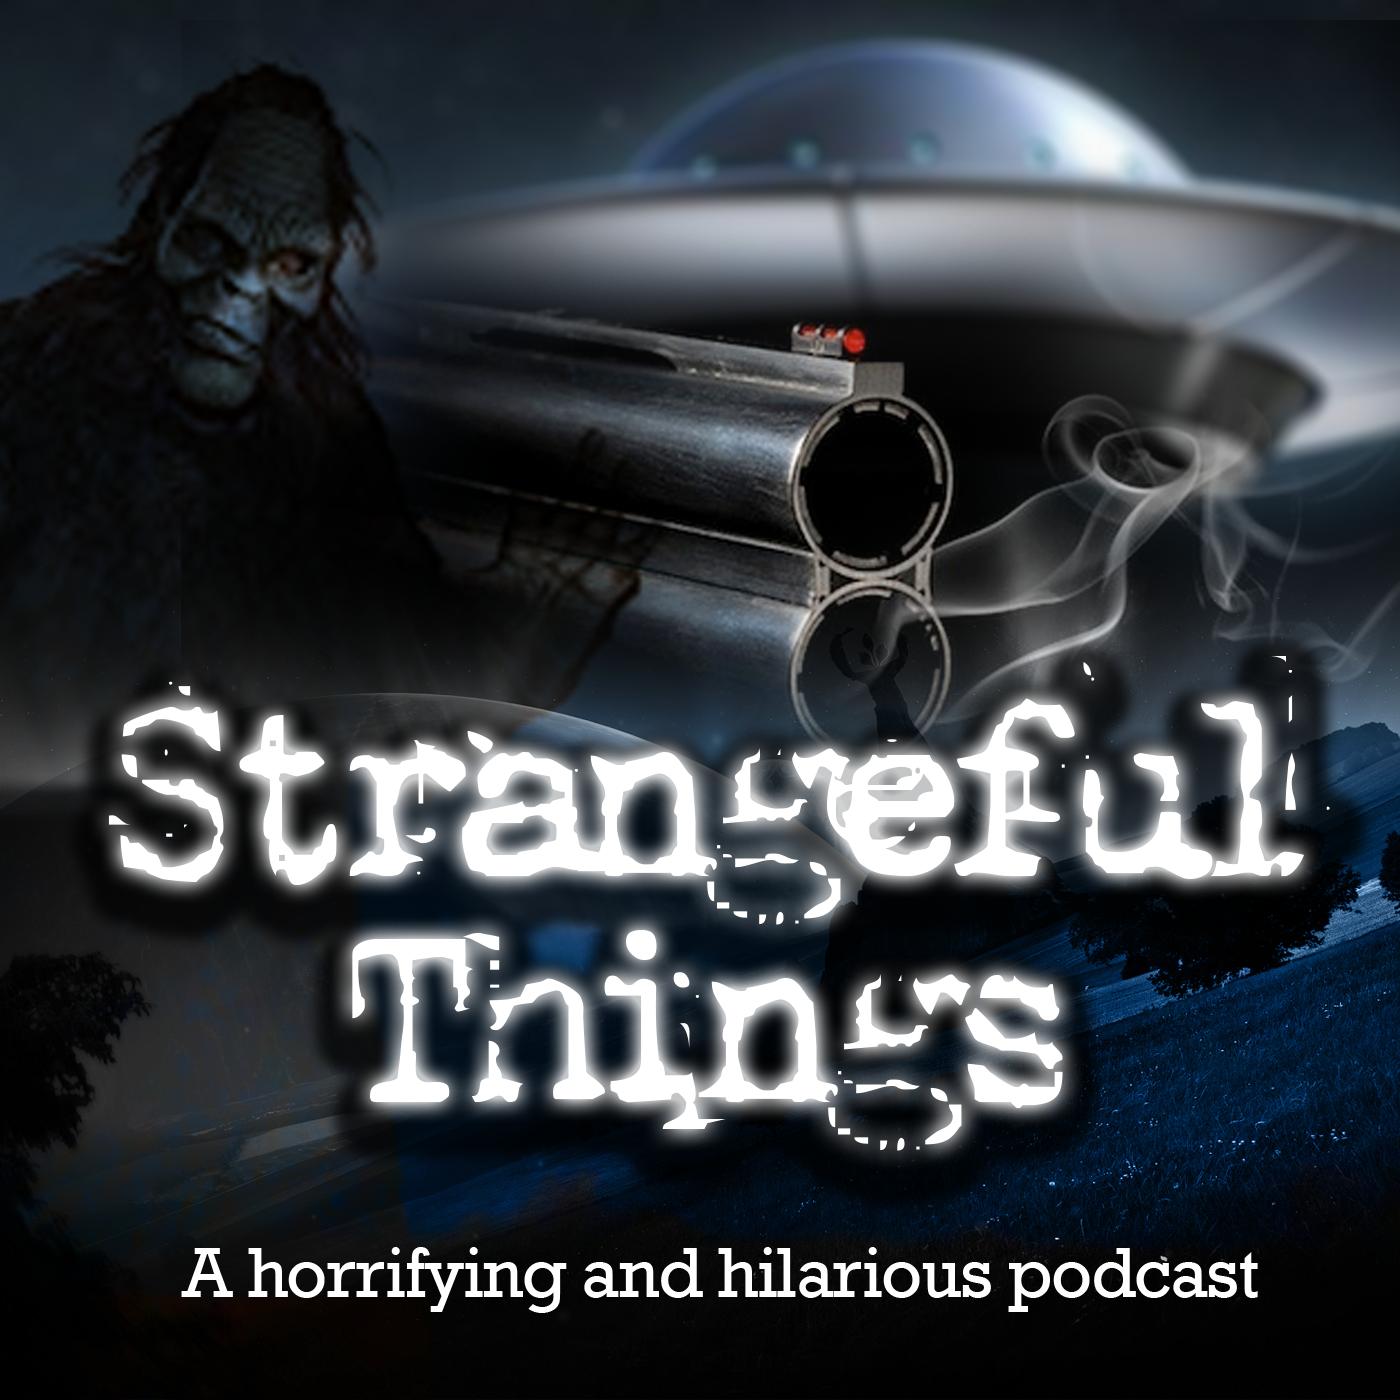 Strangeful Things   Listen via Stitcher for Podcasts